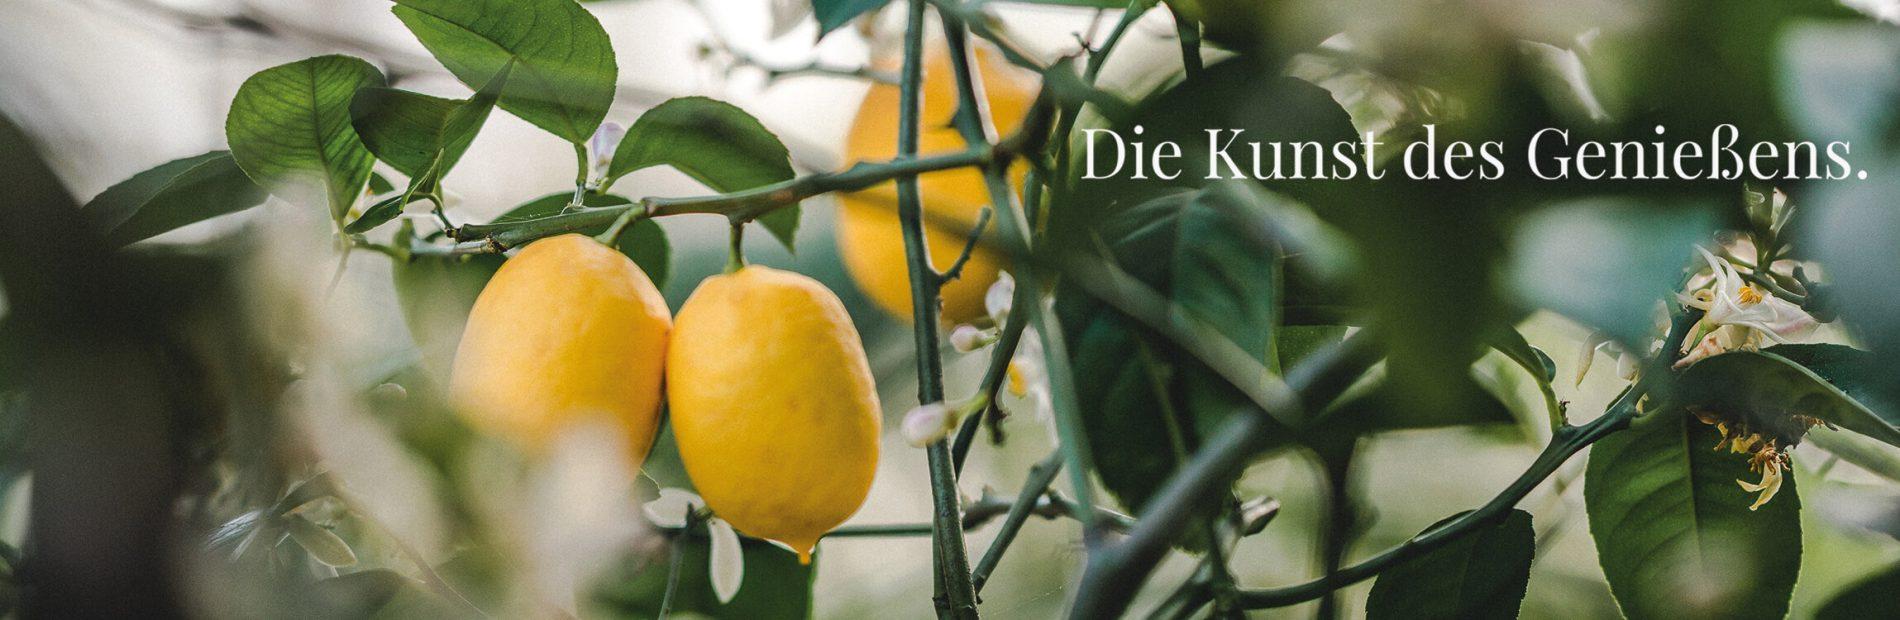 Zitrone Claim